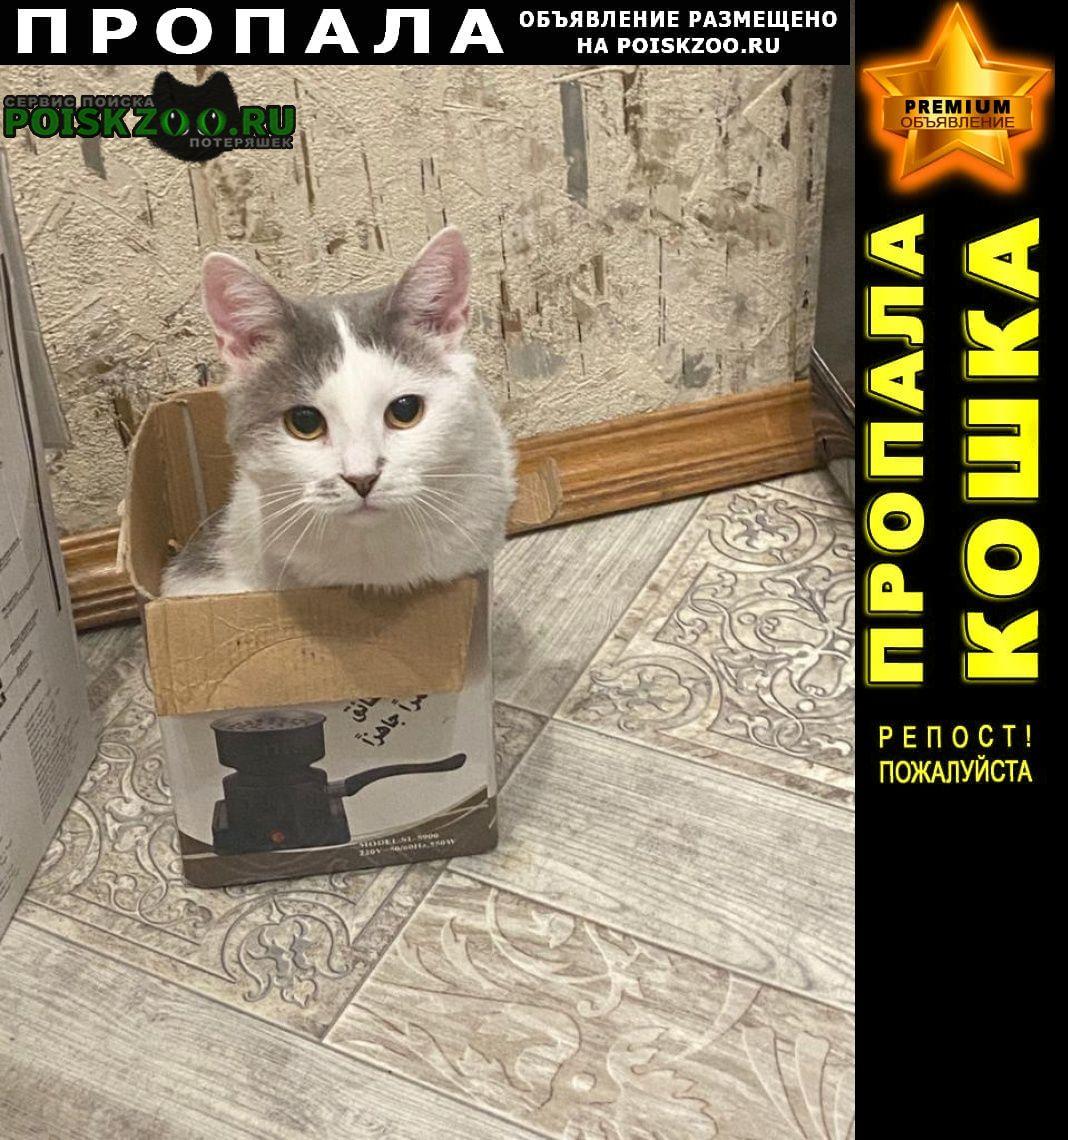 Пропала кошка киса по кличке бусинка Купавна